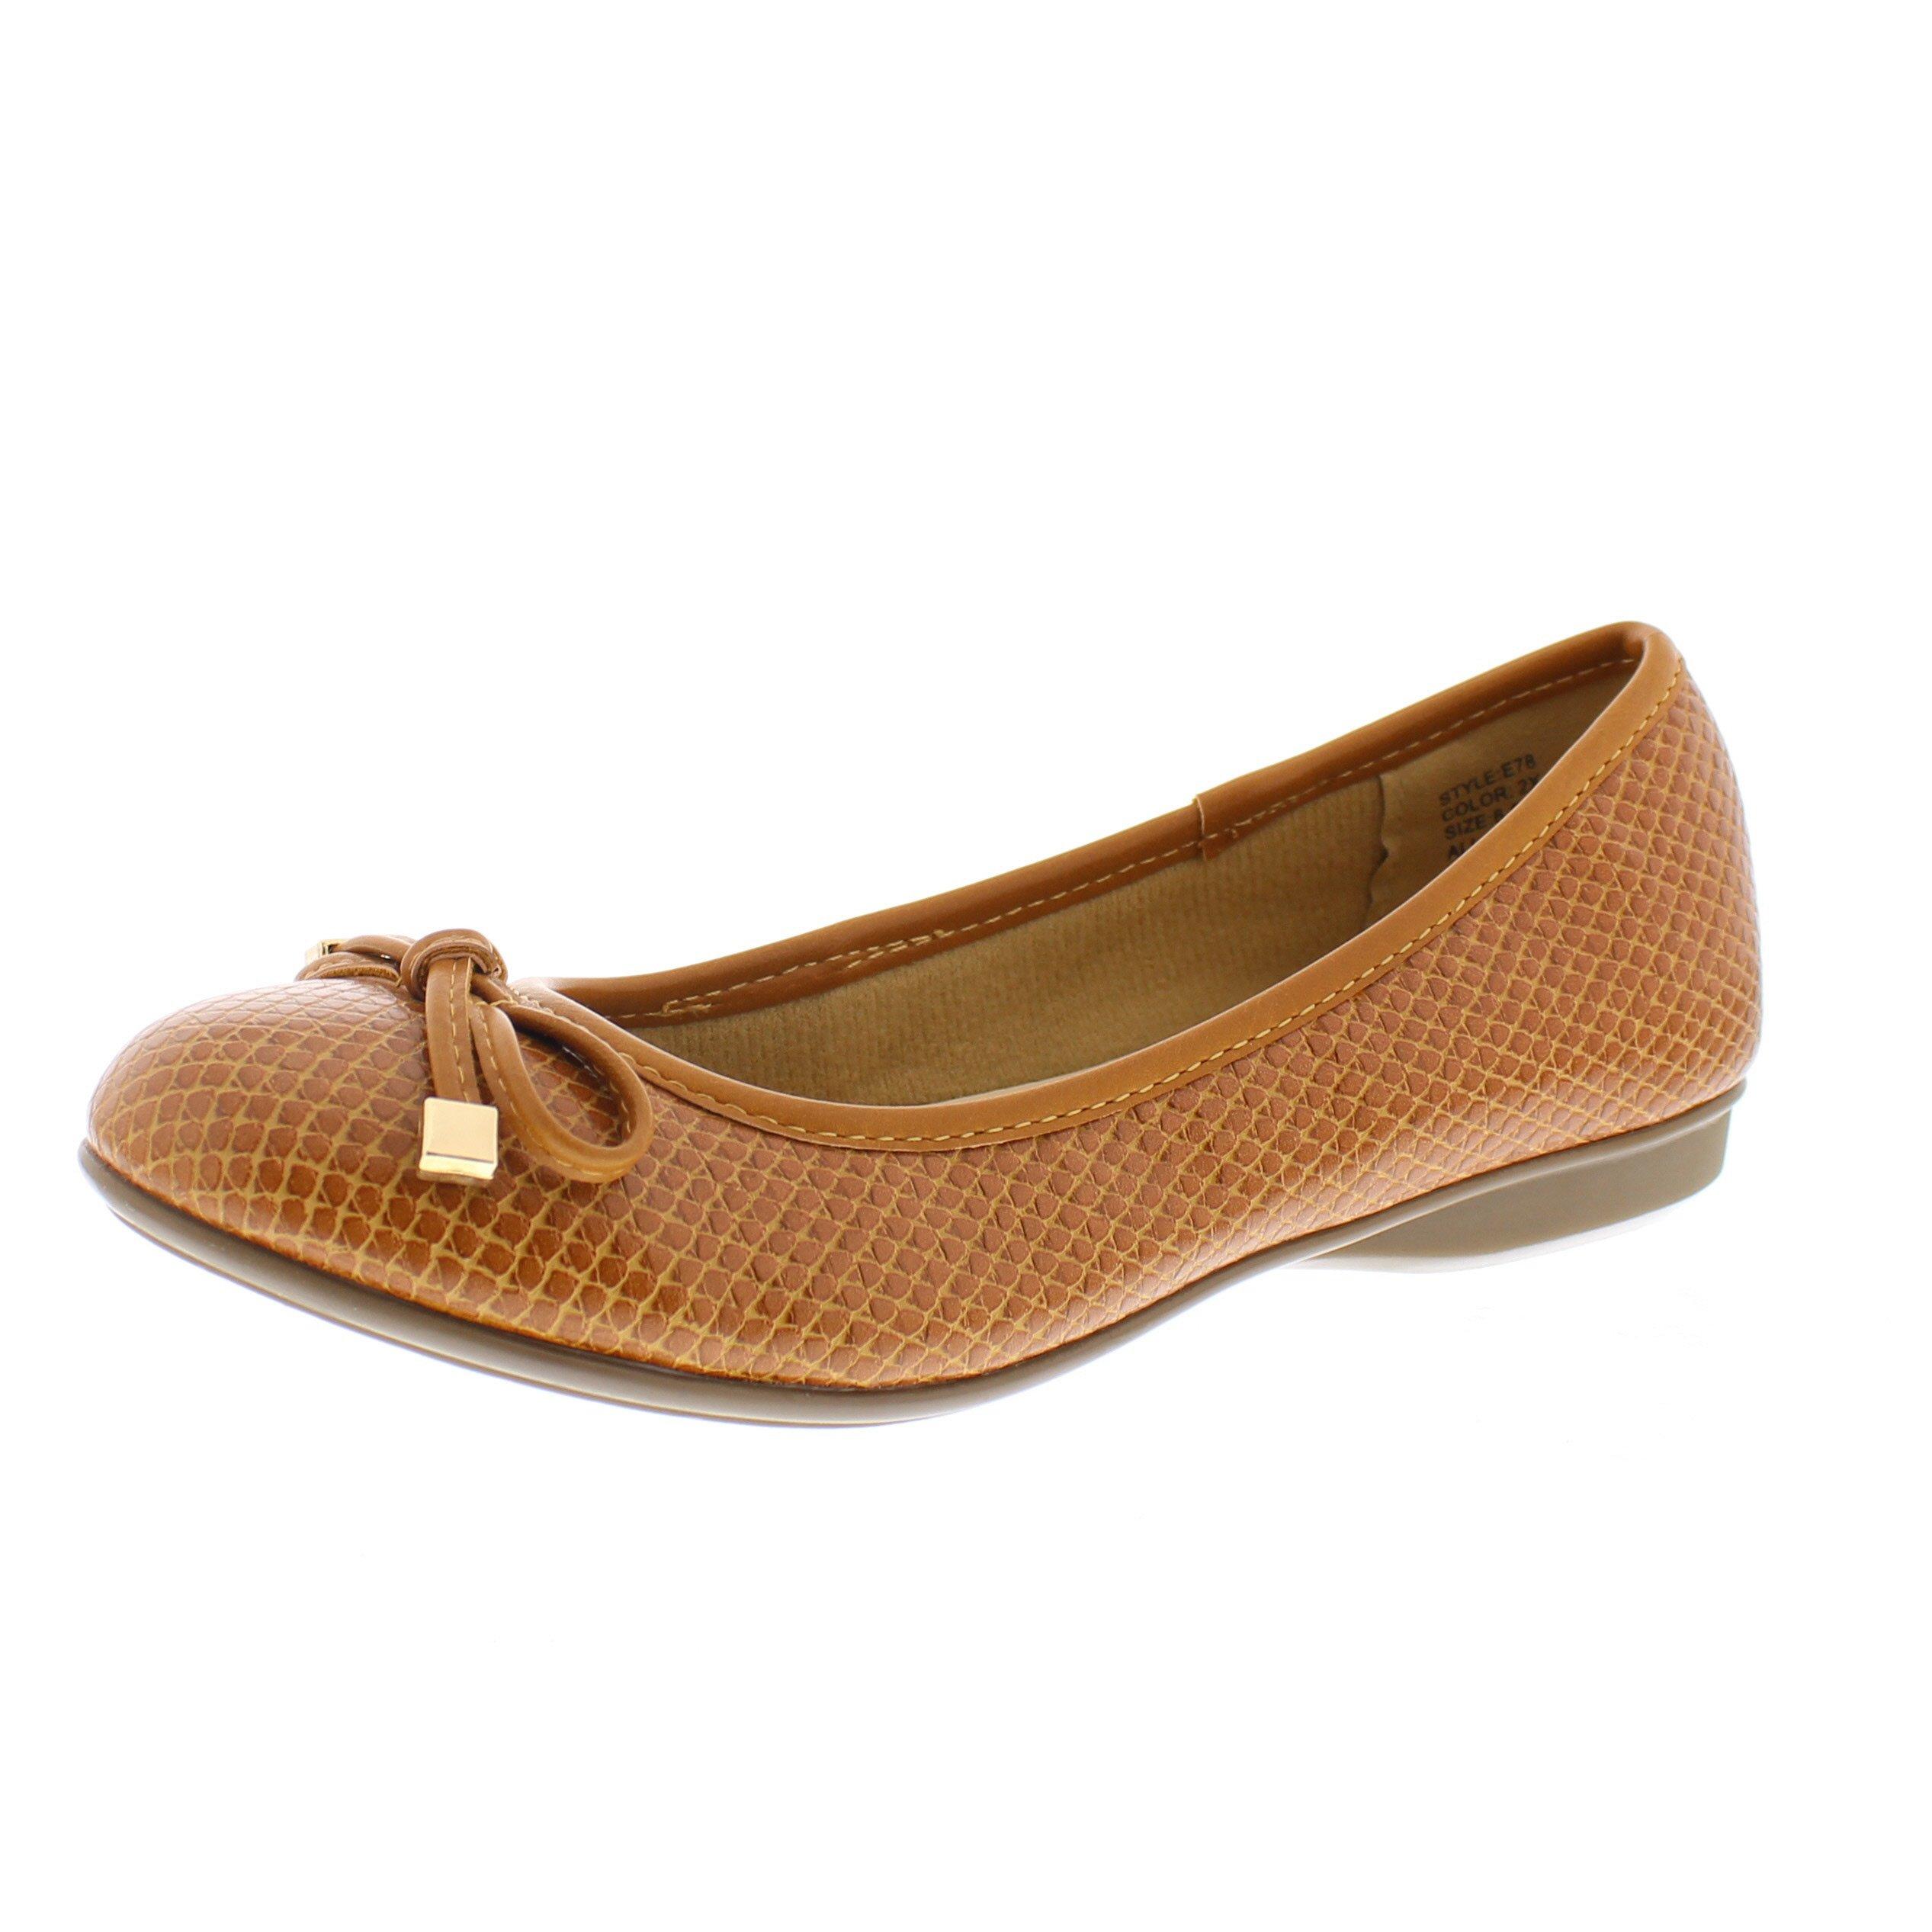 Gold Toe Malorie Womens Comfortable Memory Foam Ballet Flat Shoe,Work Comfort Dress Flats Low Wedge Pump Women Camel 9W US